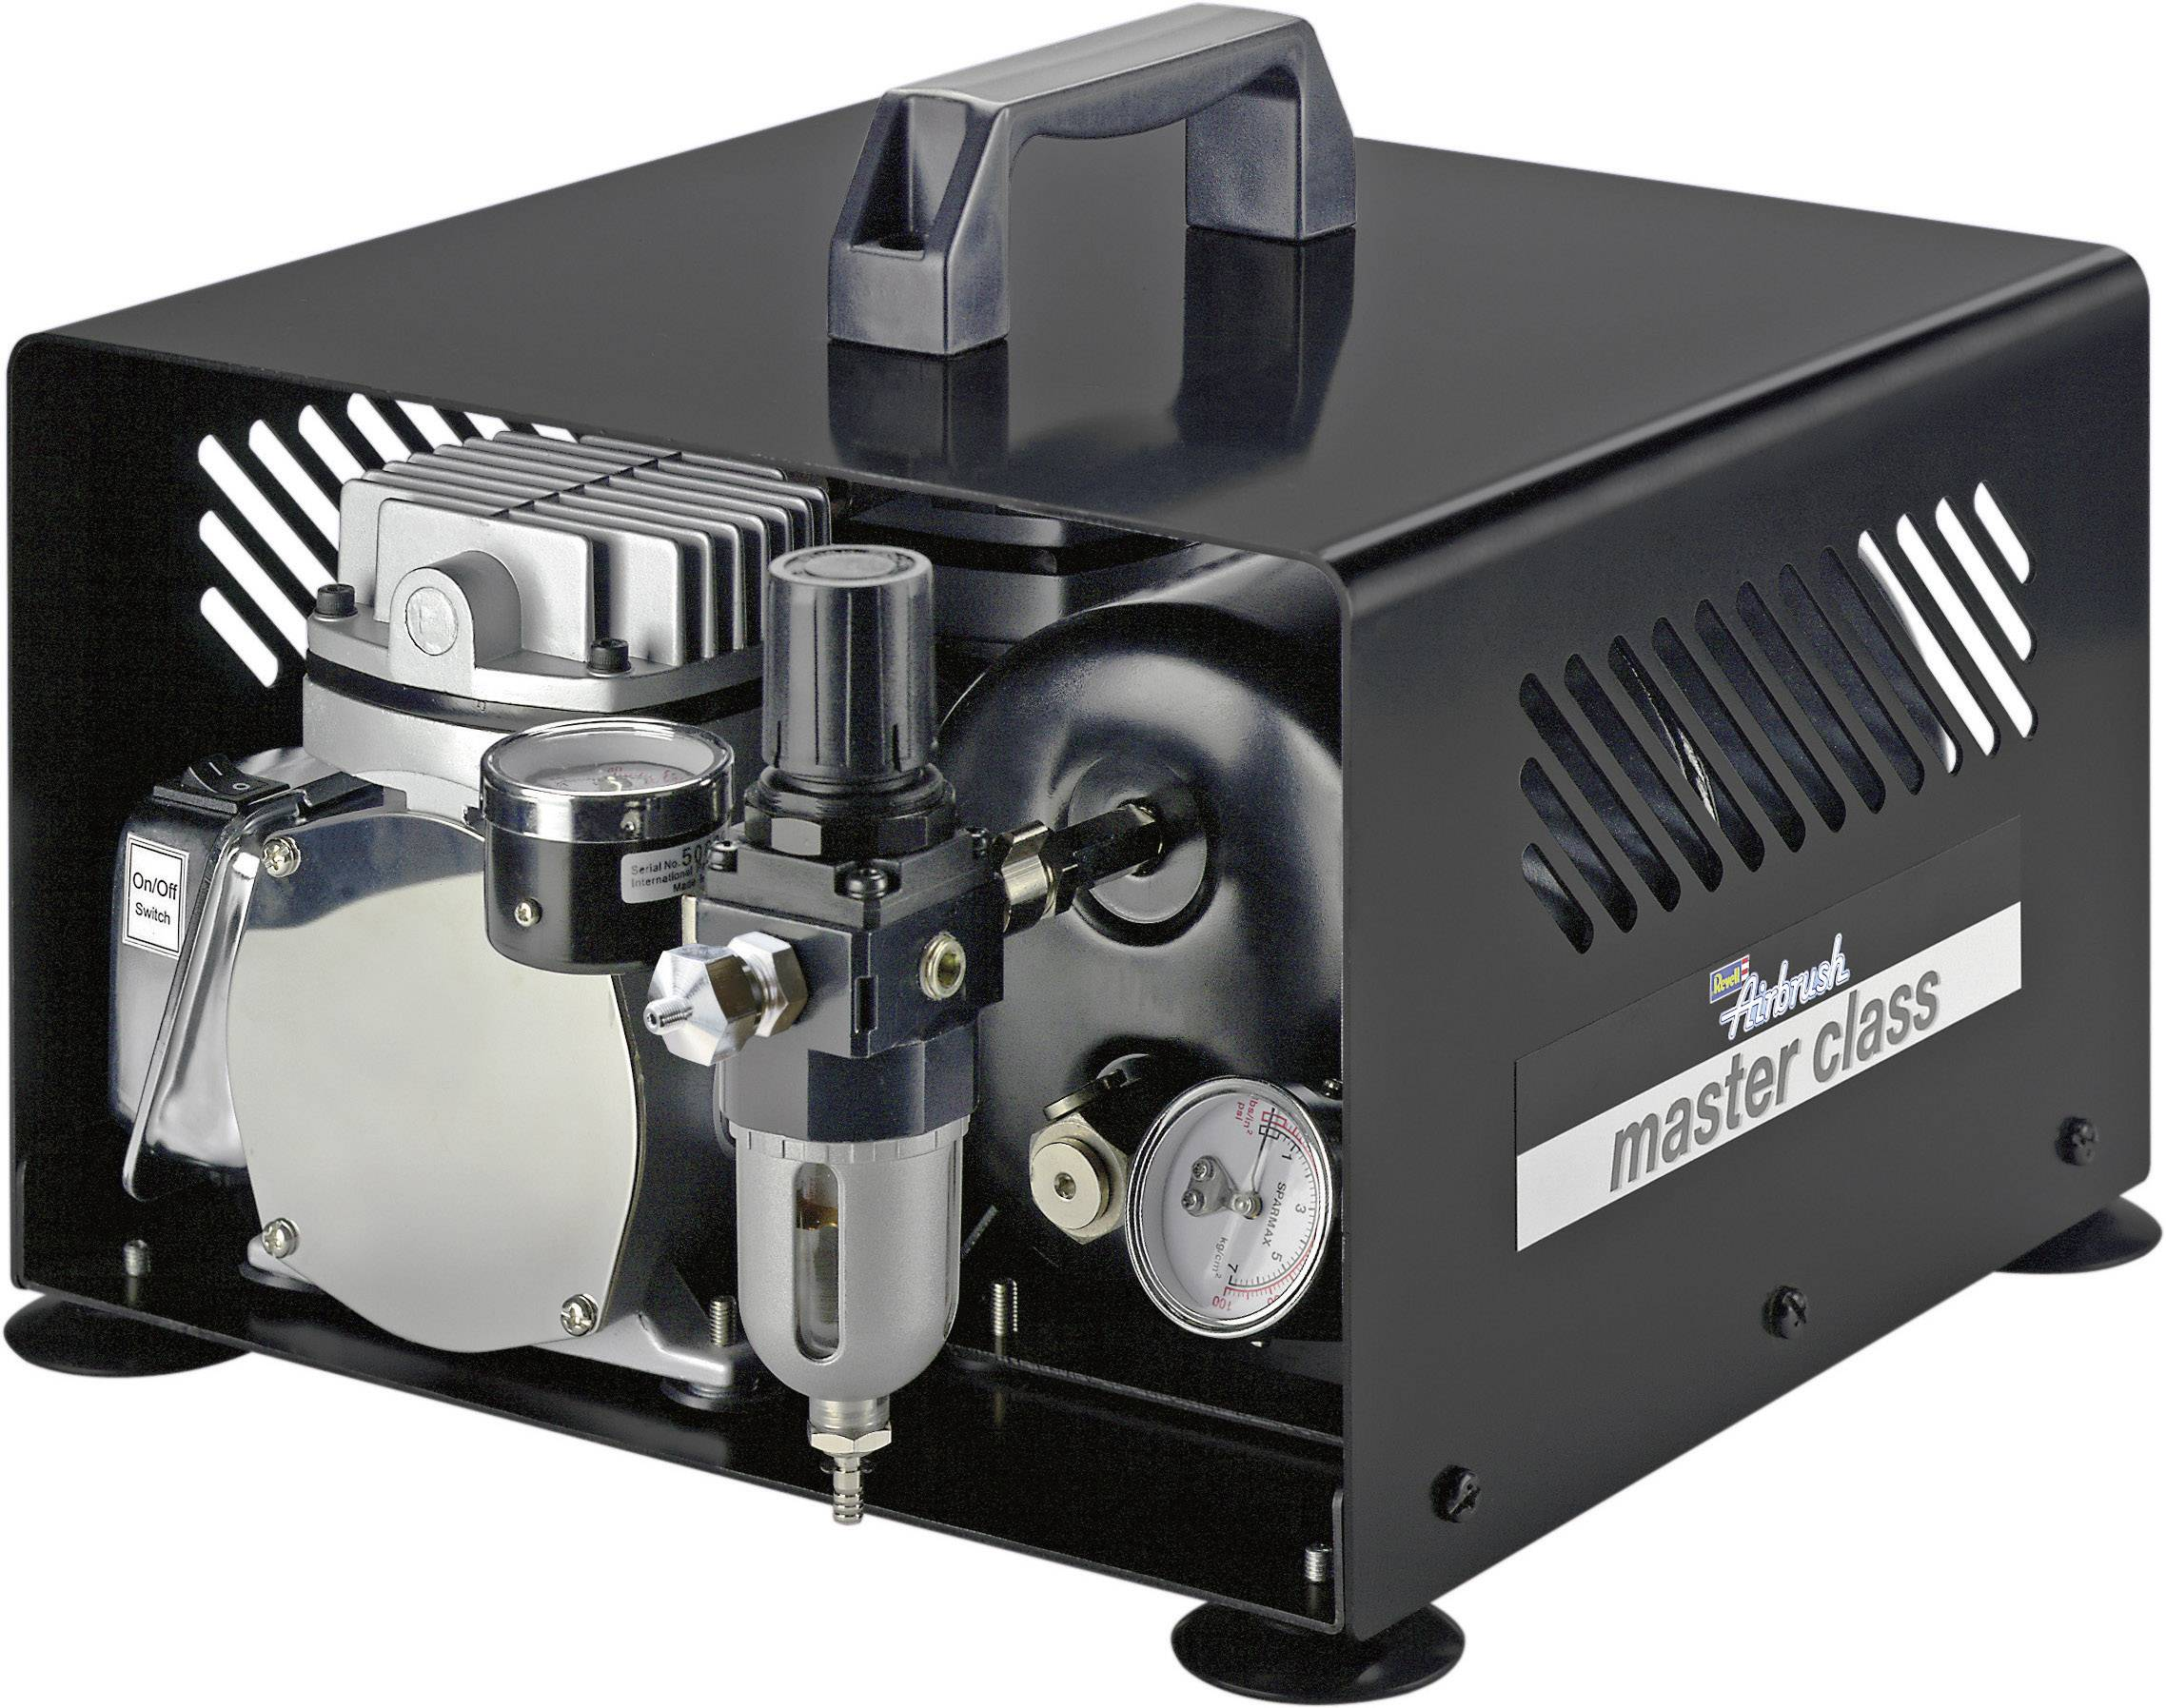 Airbrush kompresor Revell 39138, 5.5 bar, 32 l/min